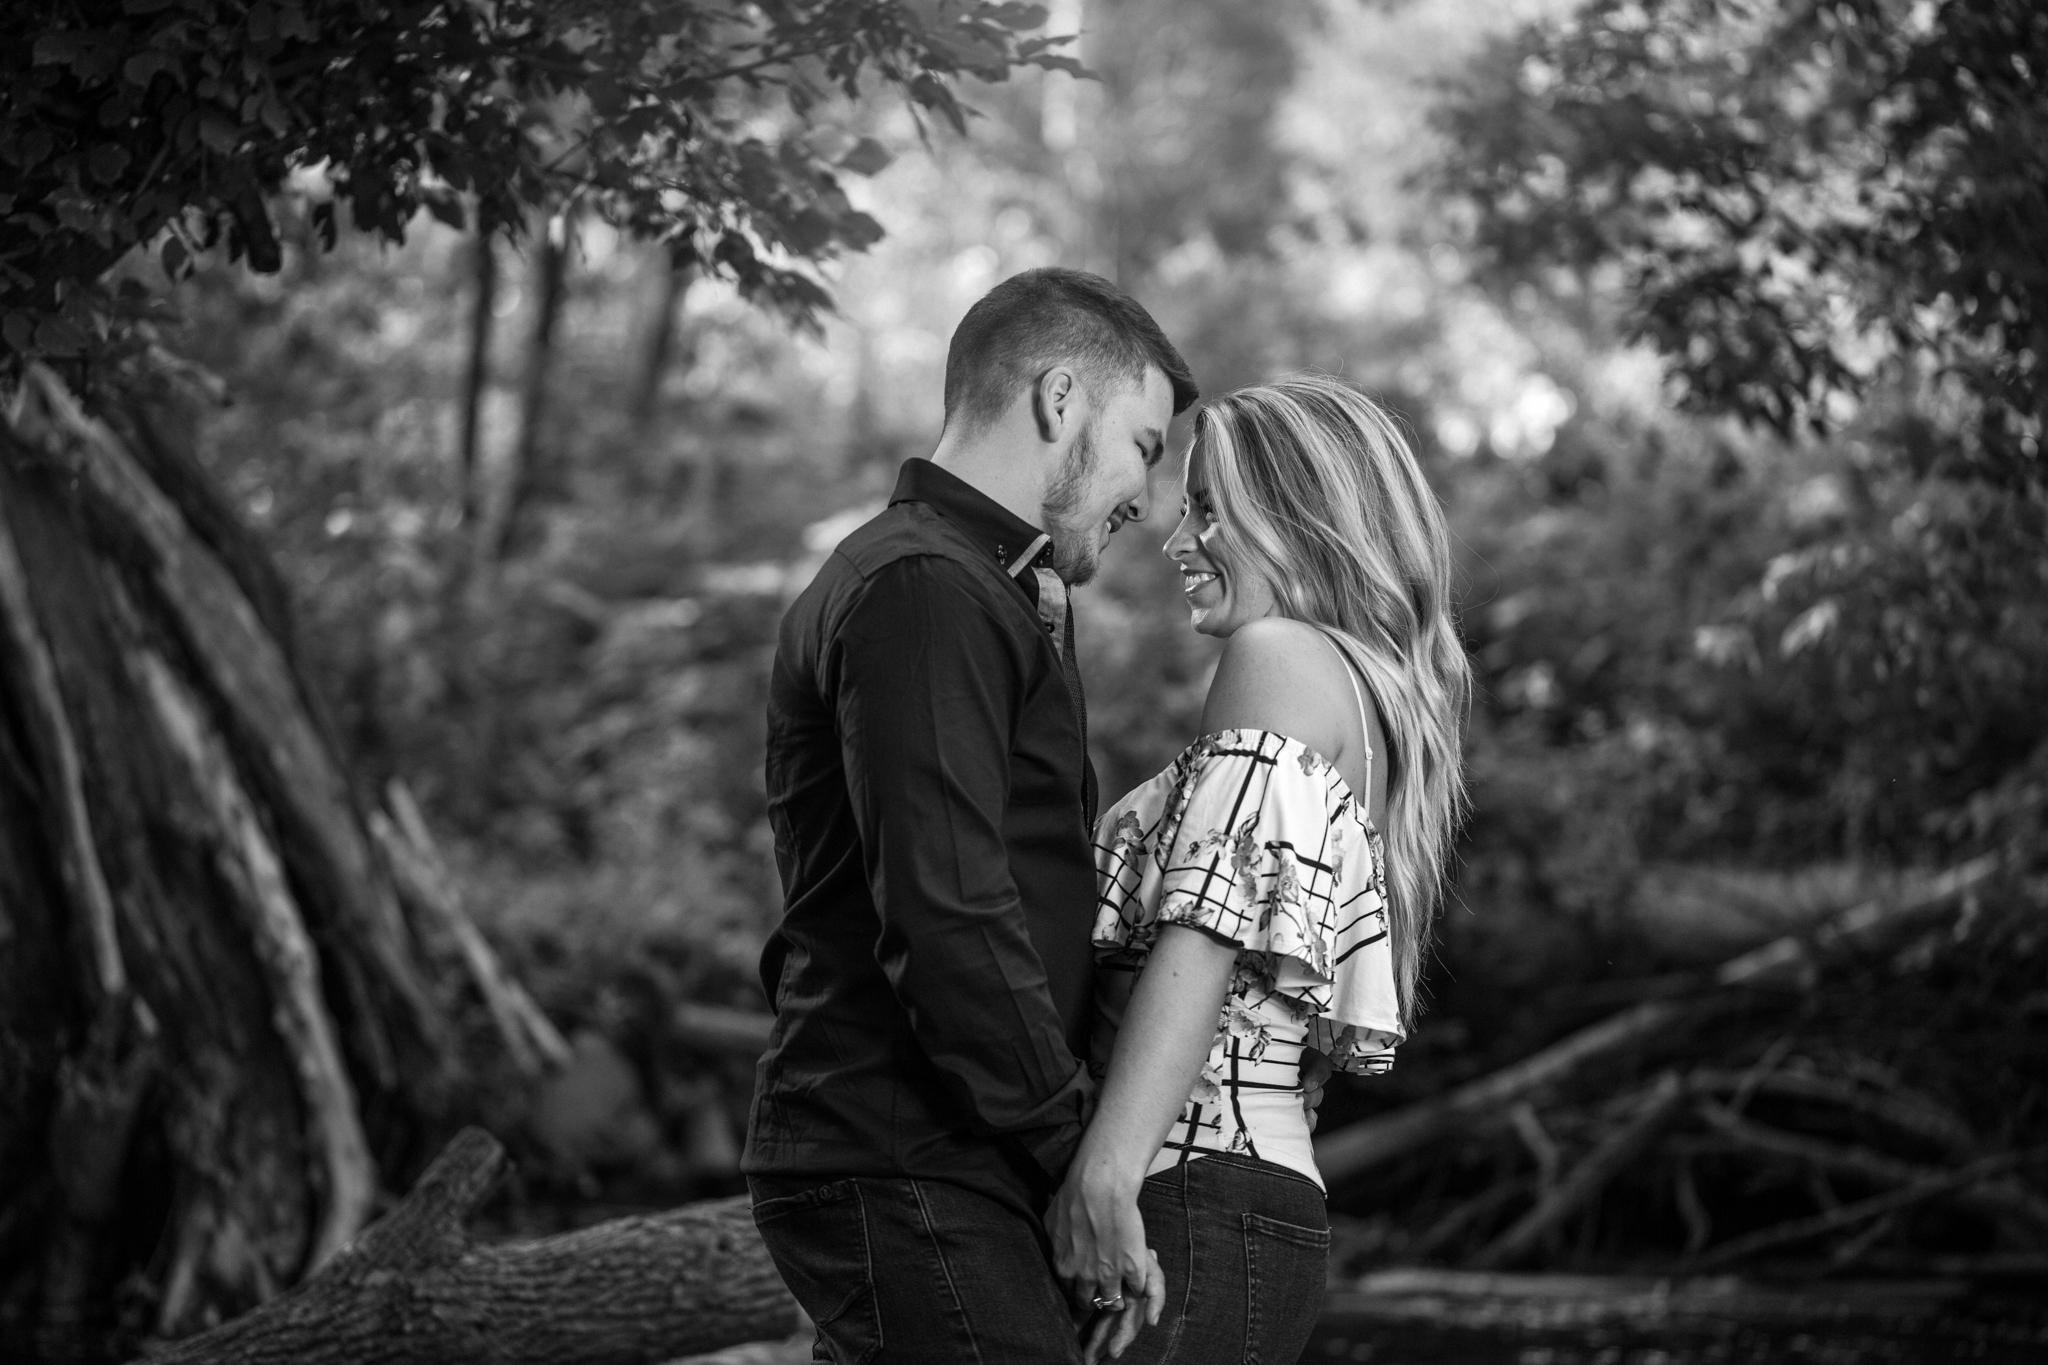 Engagement // Lori-Anne Crewe // Cast & Crewe Photography // Ayr // Ontario